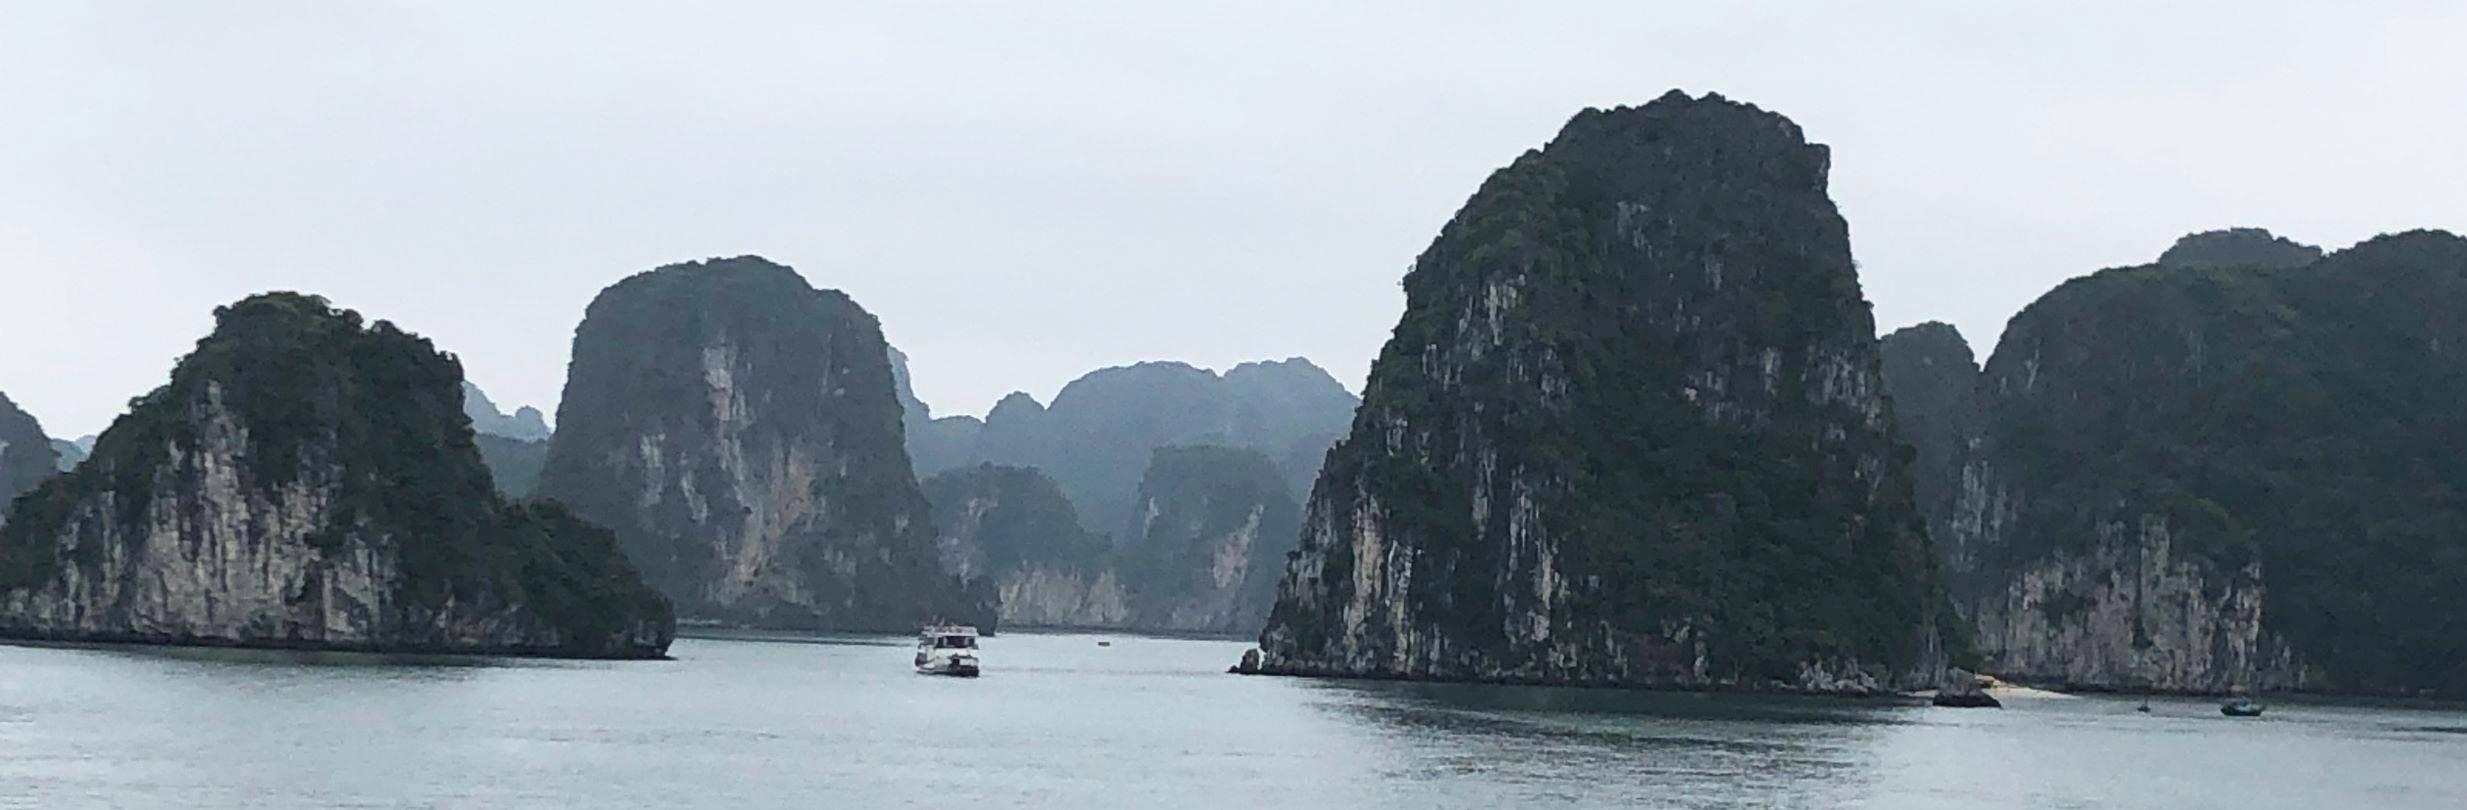 Travelbay Customer Reviews - Vietnam Tours - Jack Bree